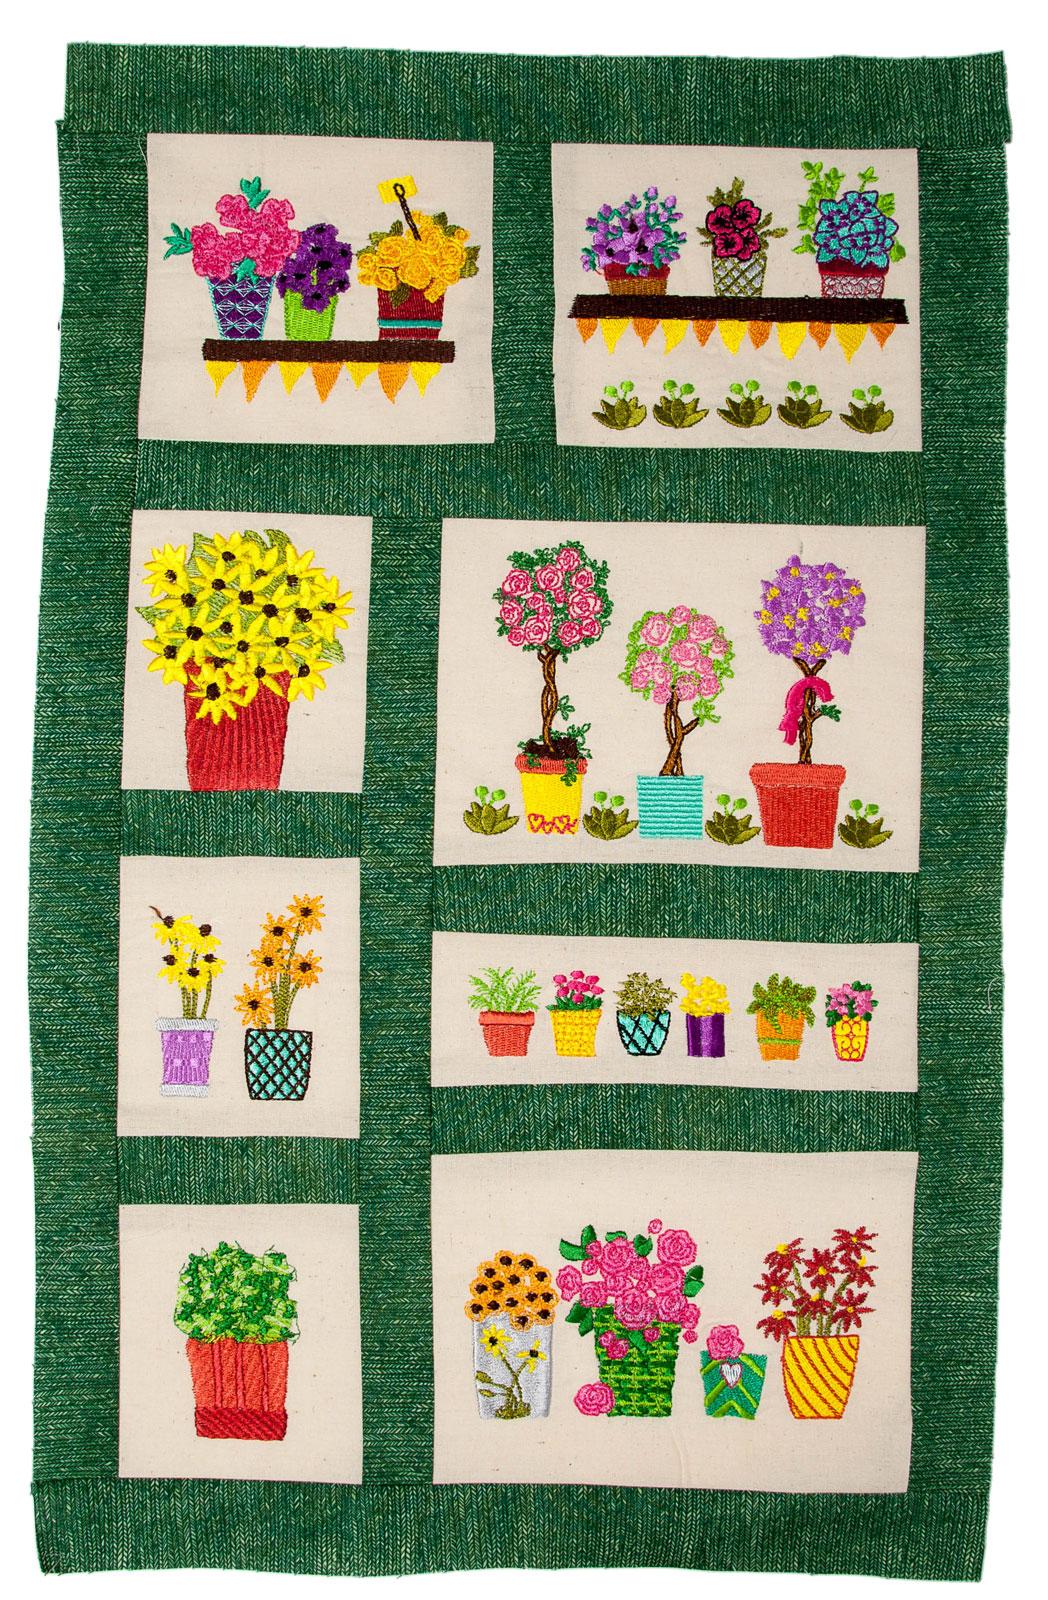 Bfc gardening quilt collection thread kit